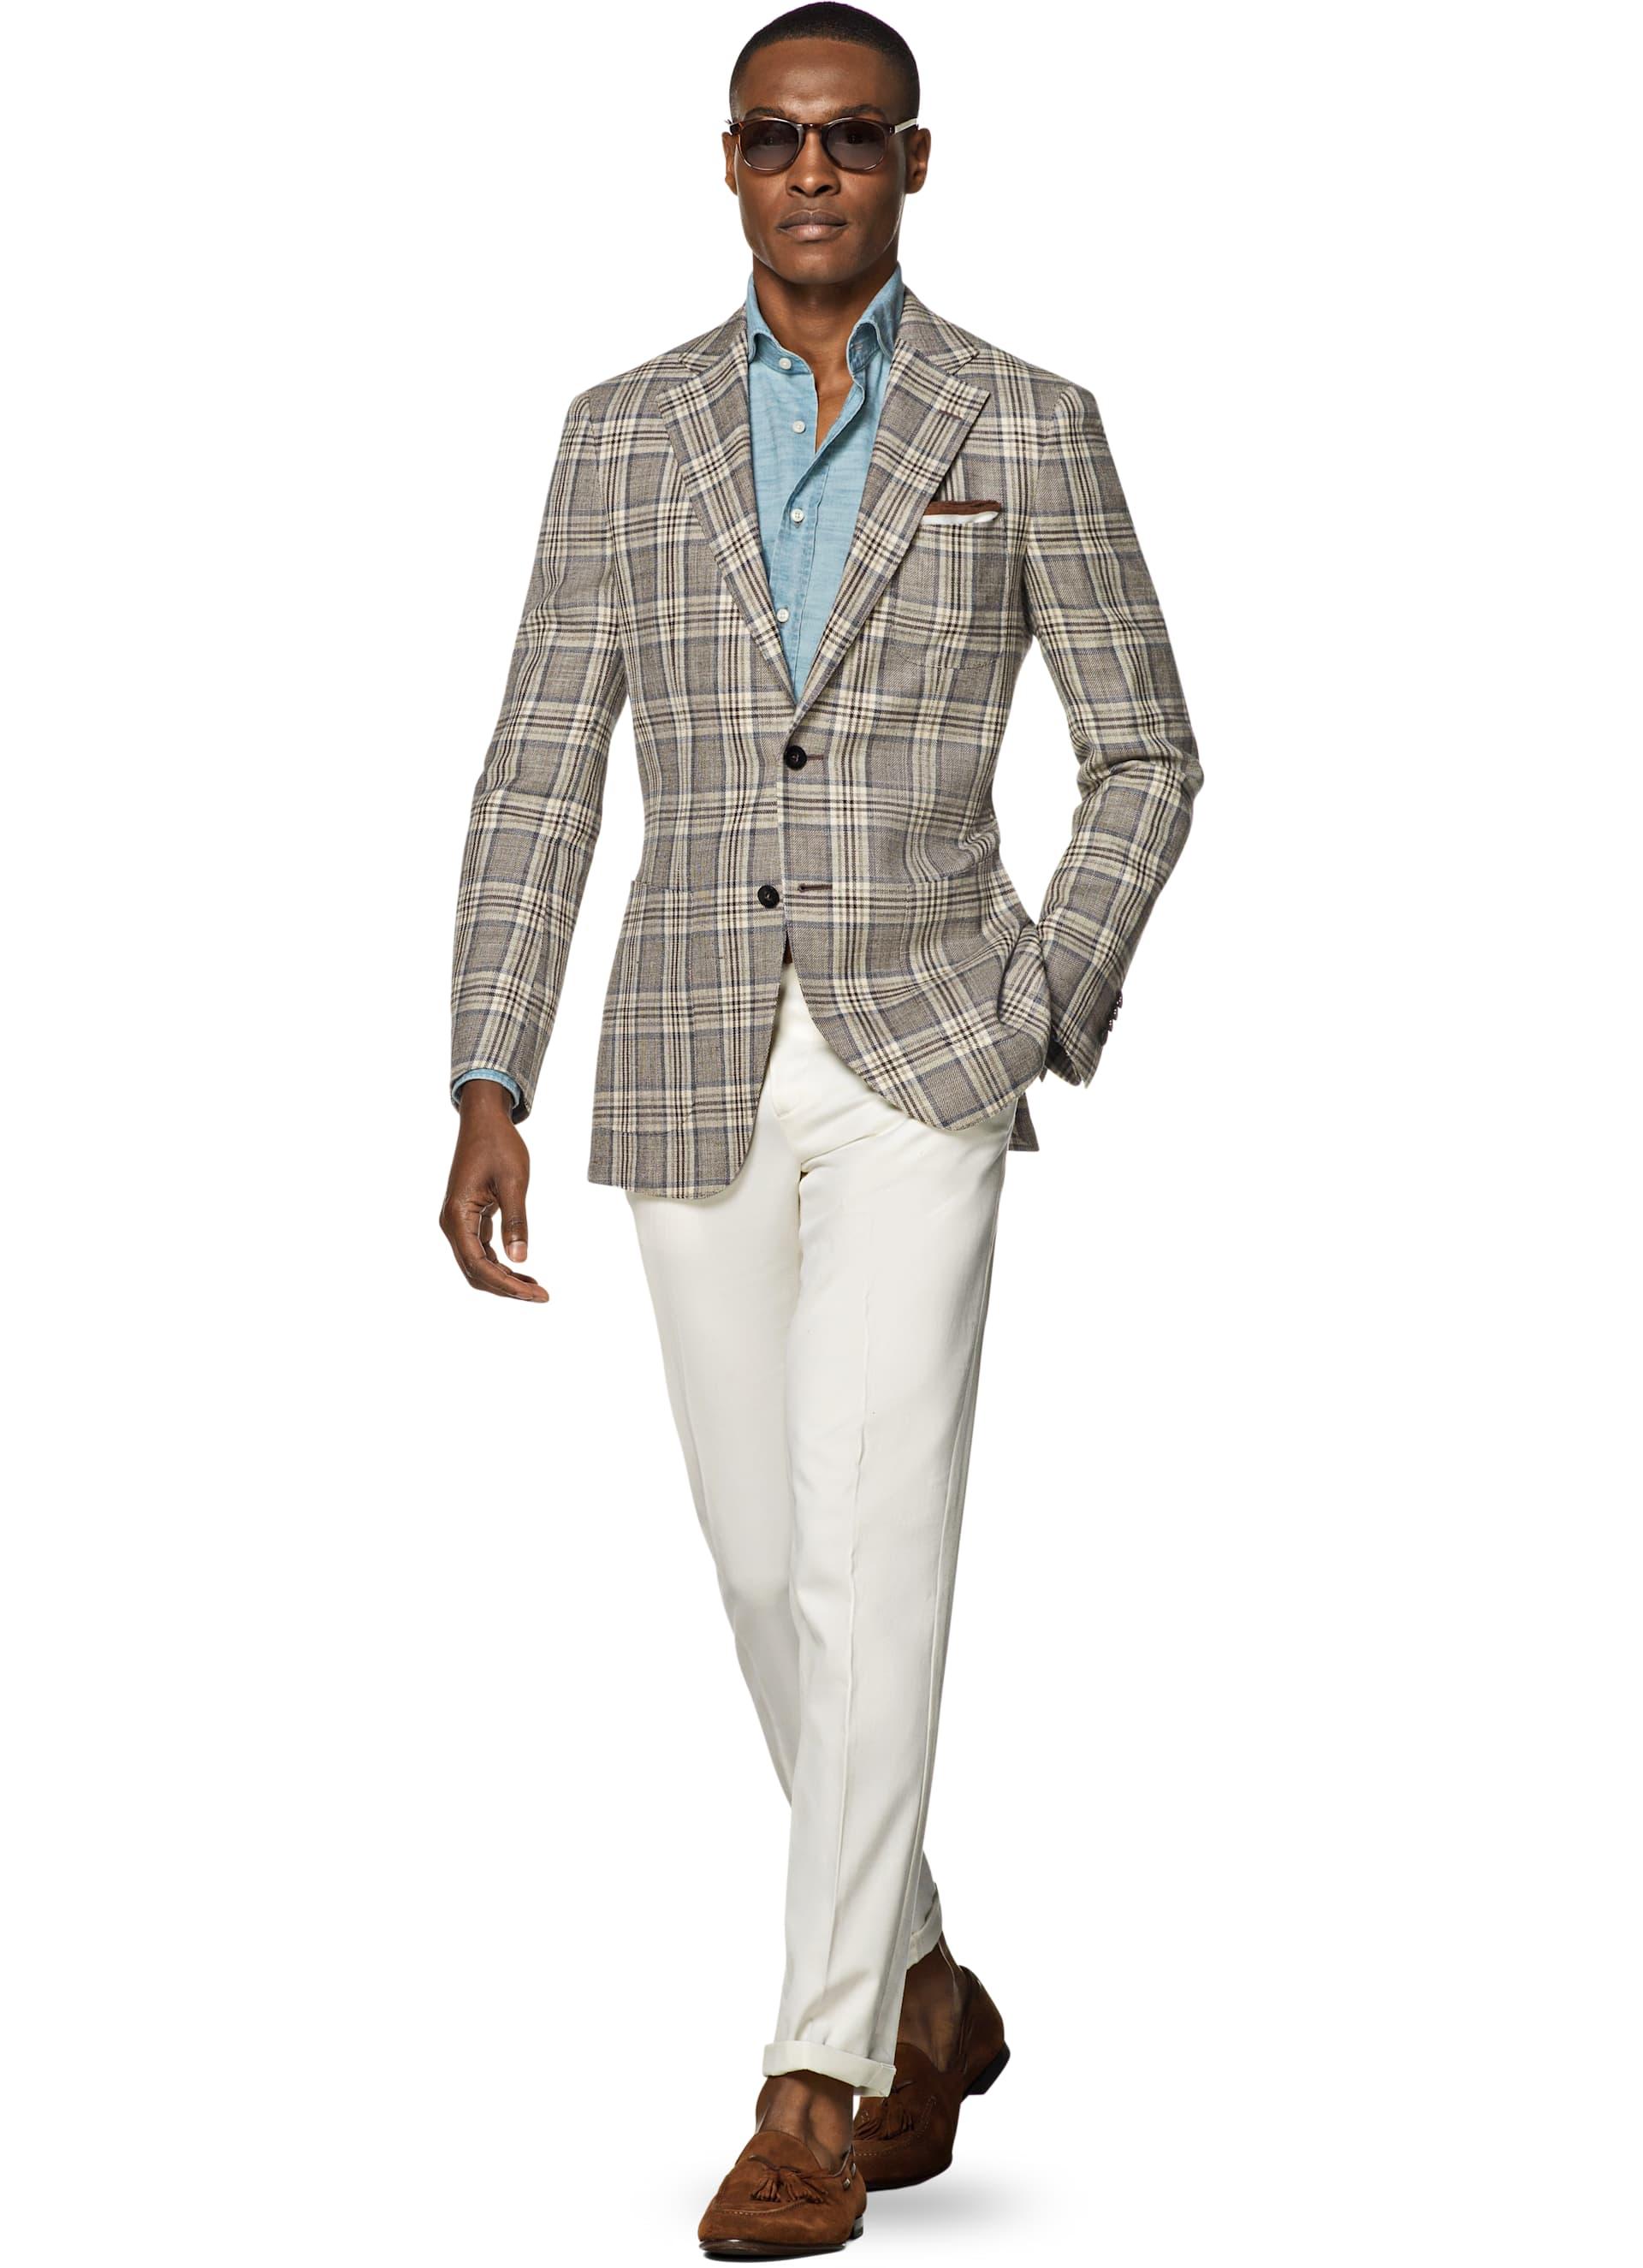 Suit jacket - Hudson Brown Check